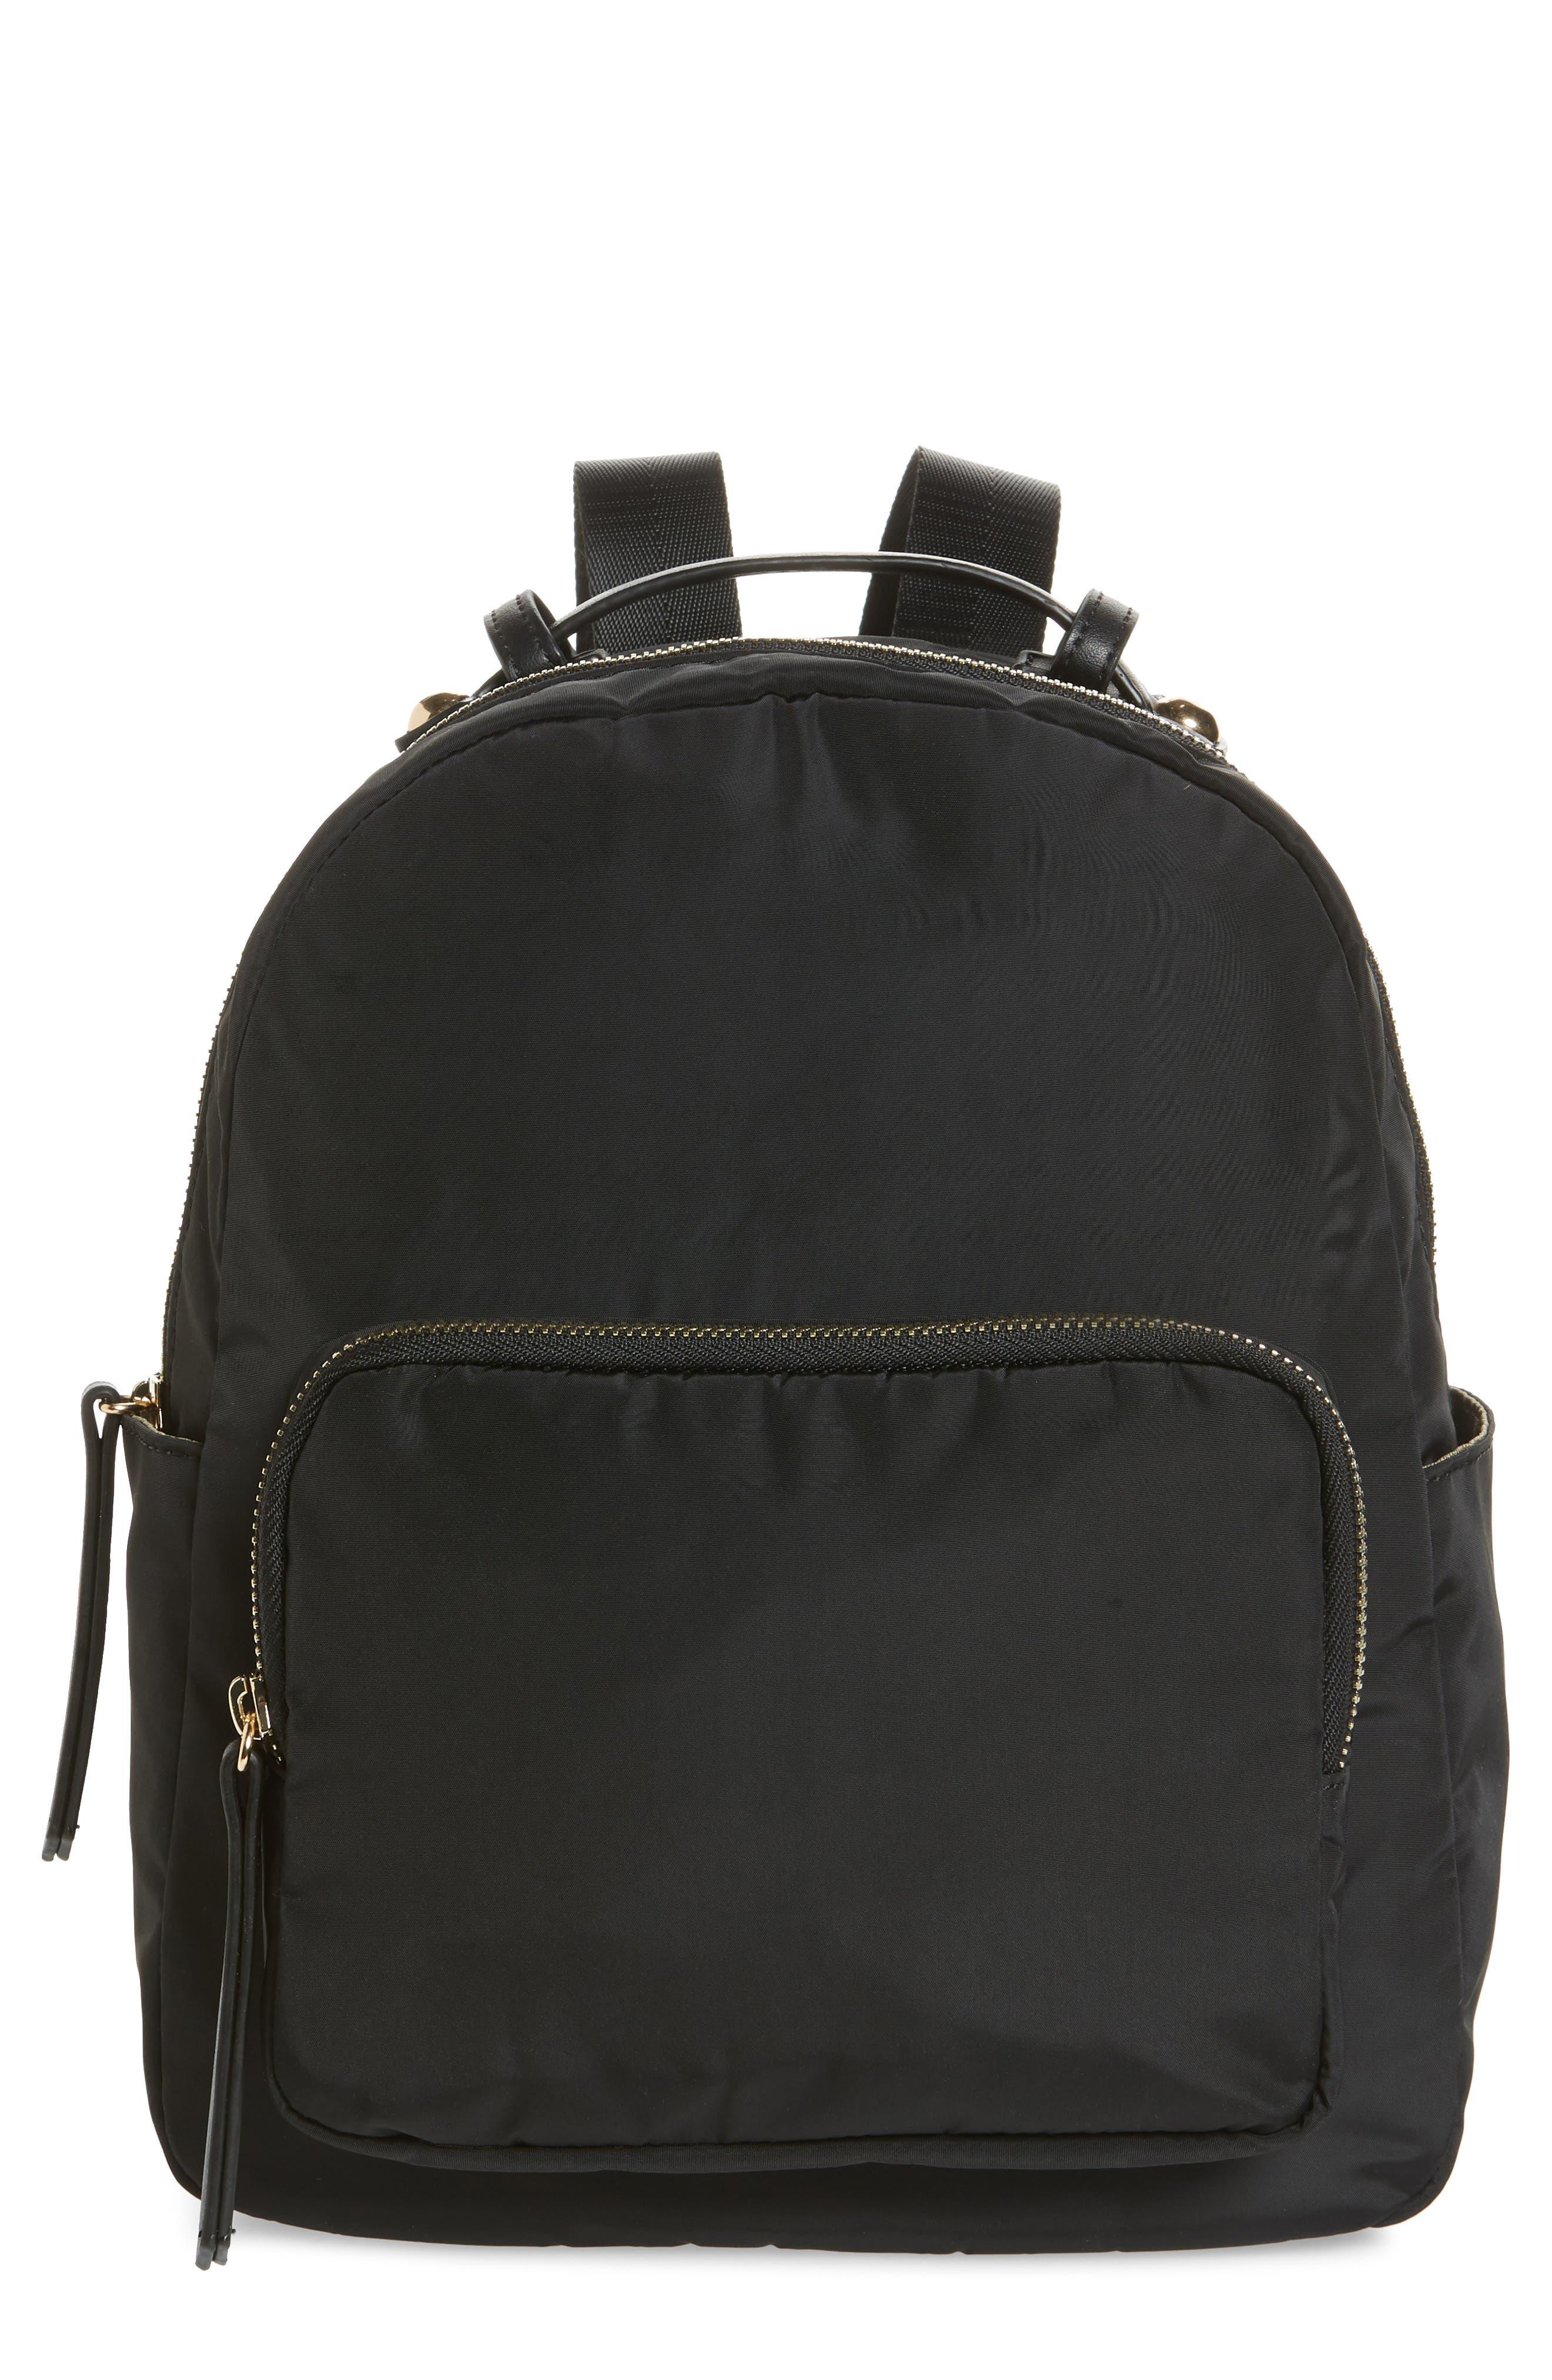 SONDRA ROBERTS Nylon Backpack, Main, color, 001